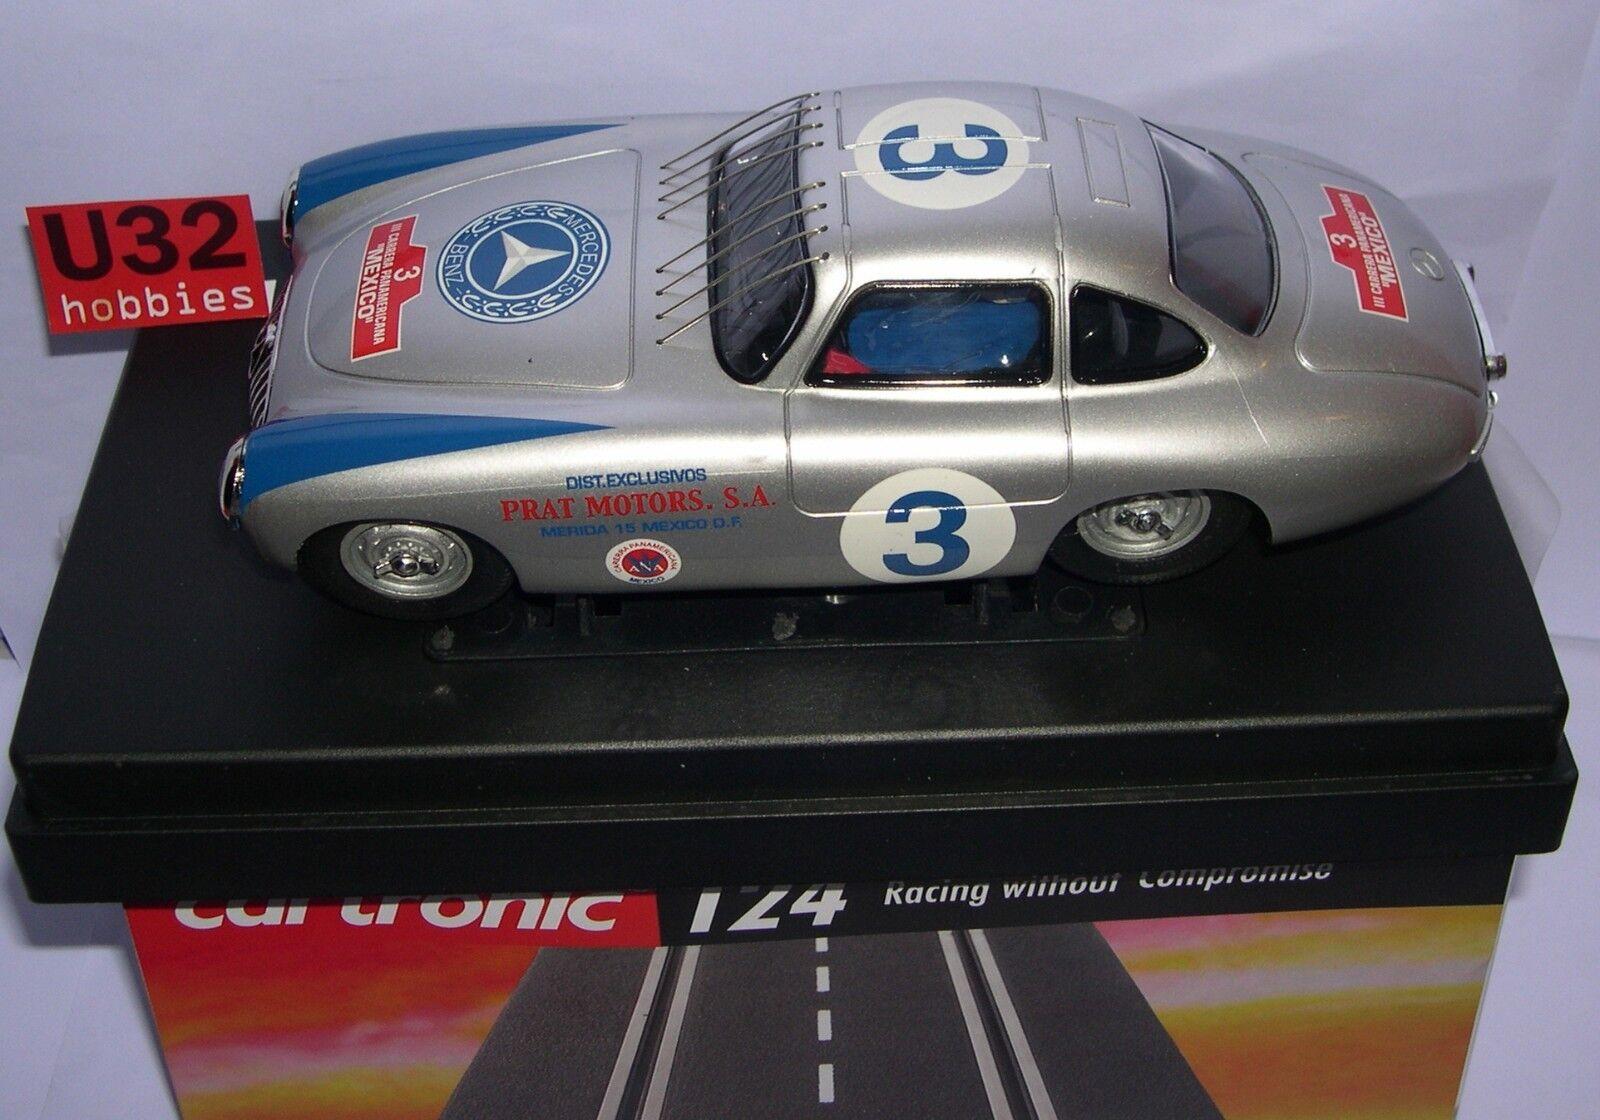 CARTRONIC 31001 SLOT CAR 1/24 1/24 1/24 MERCEDES 300 SL 3 III PAN AMERICAN MEXICO MB ddde0a